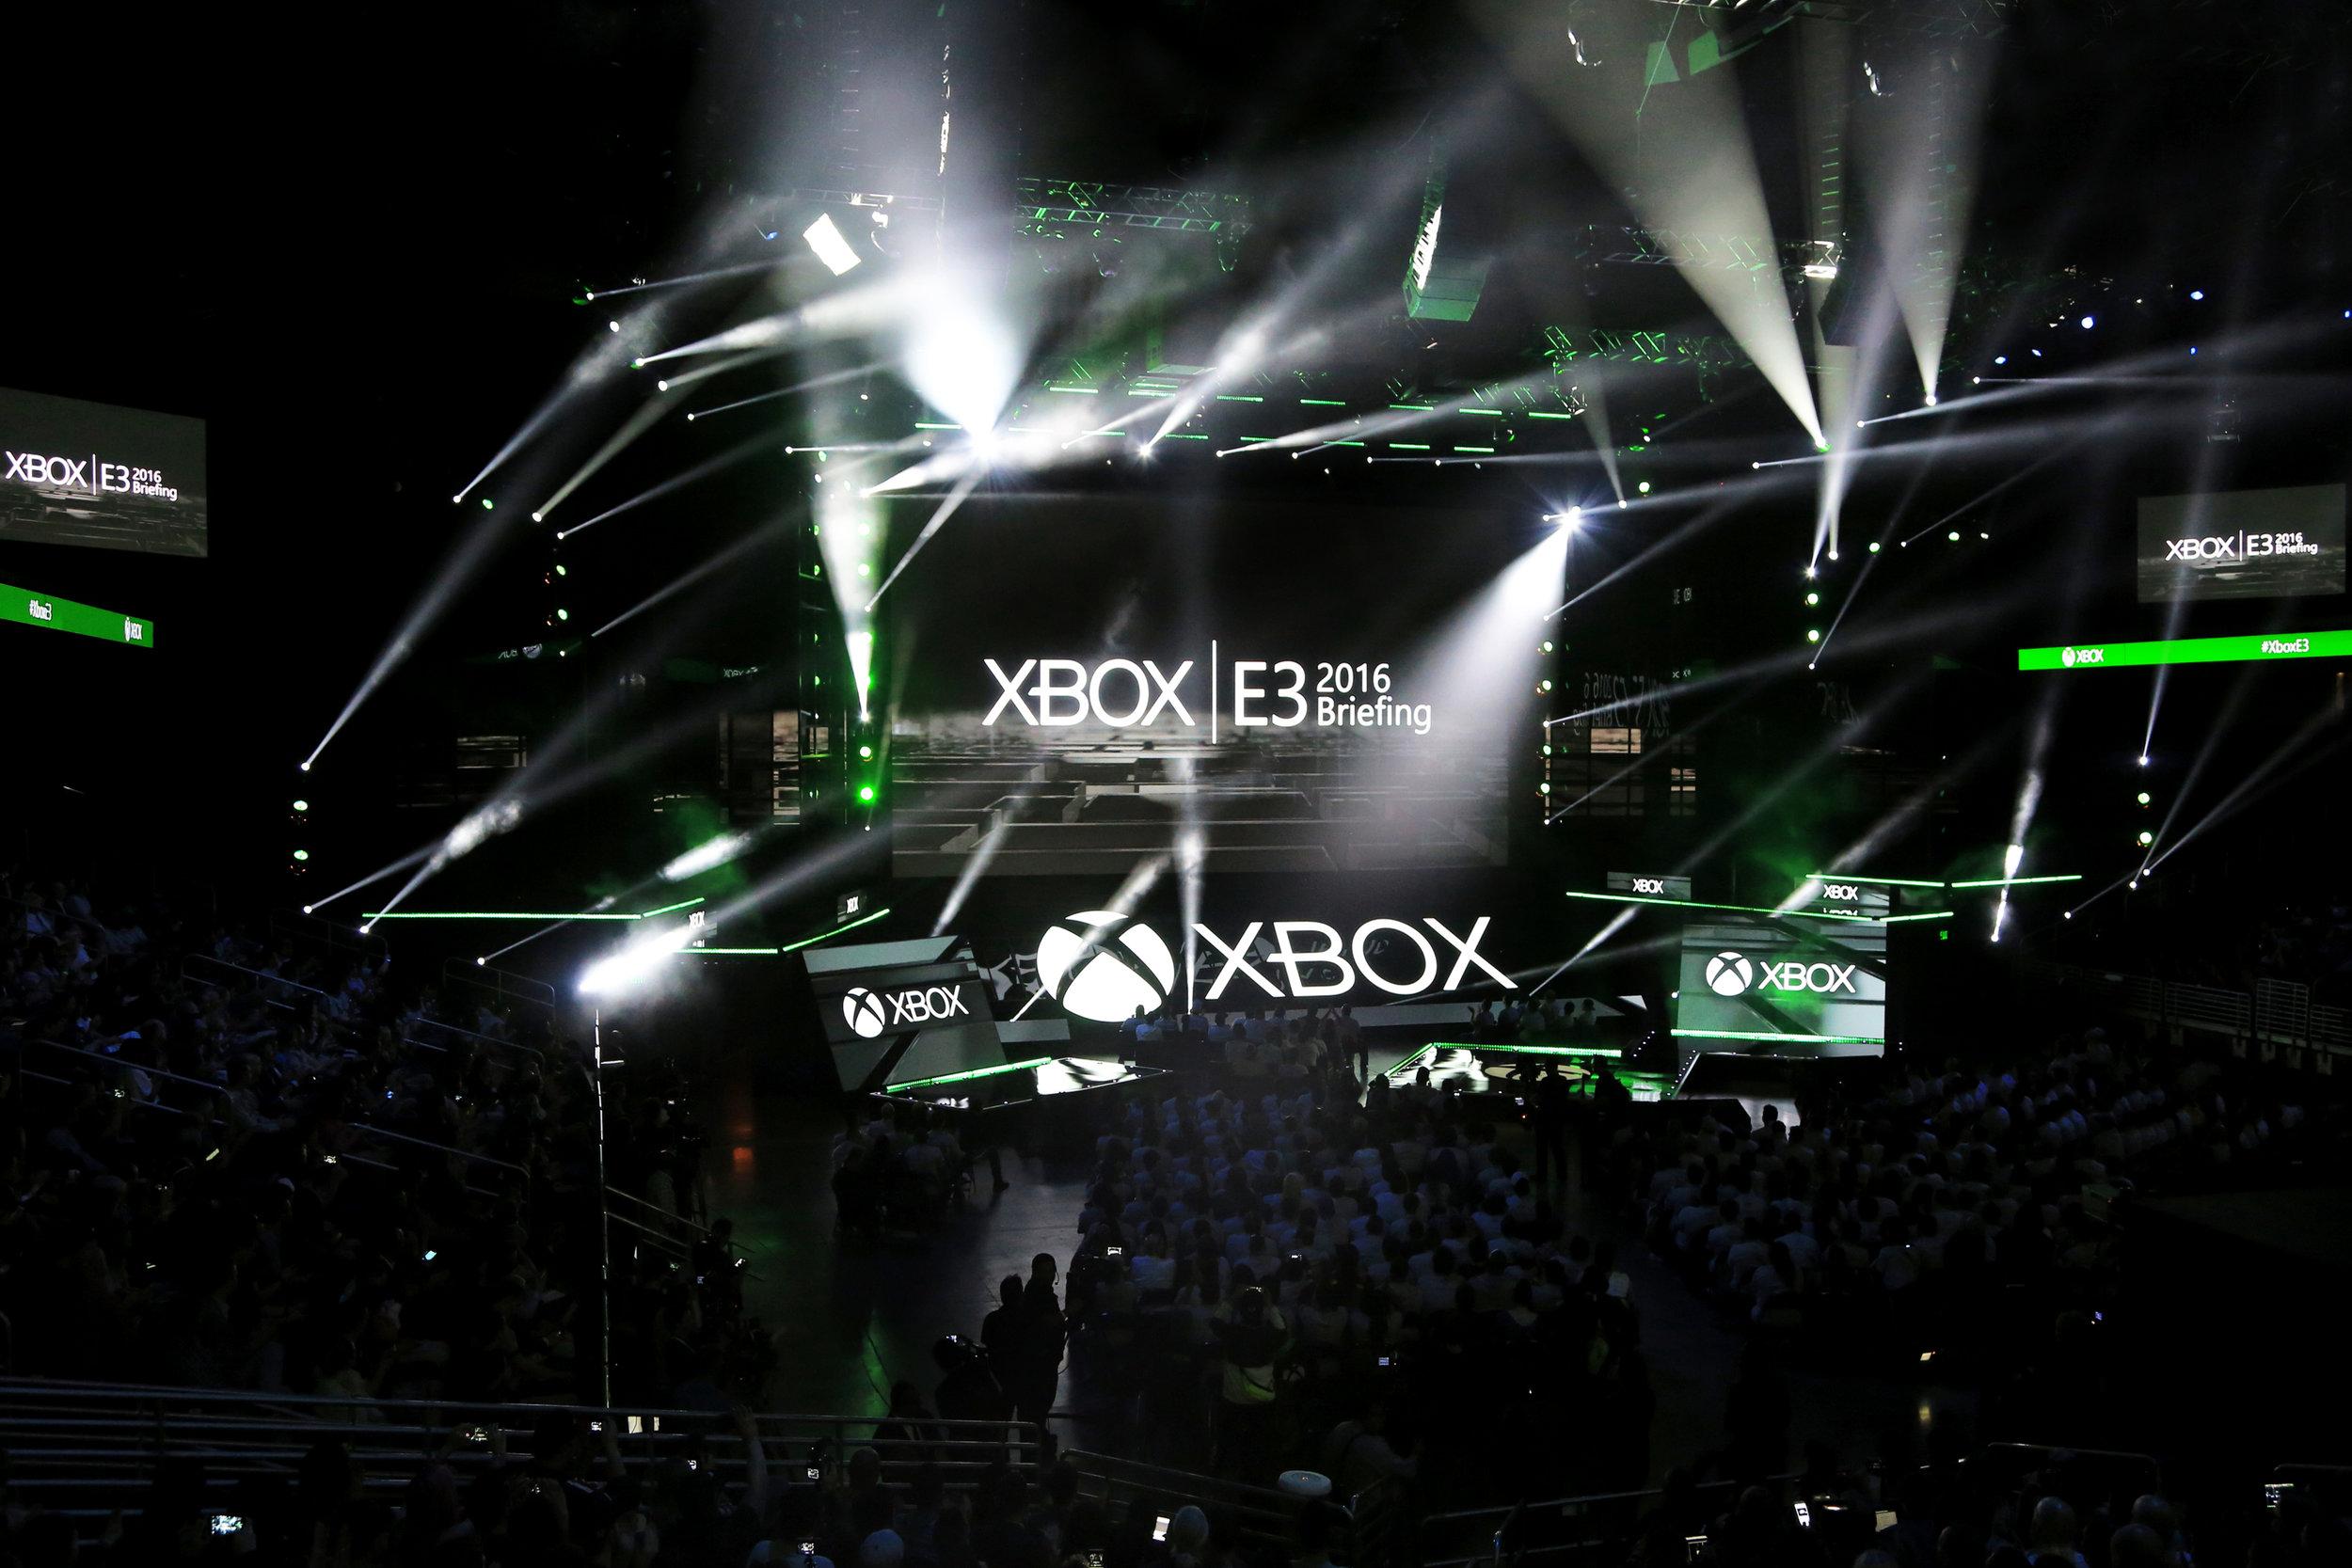 Xbox E3 2016